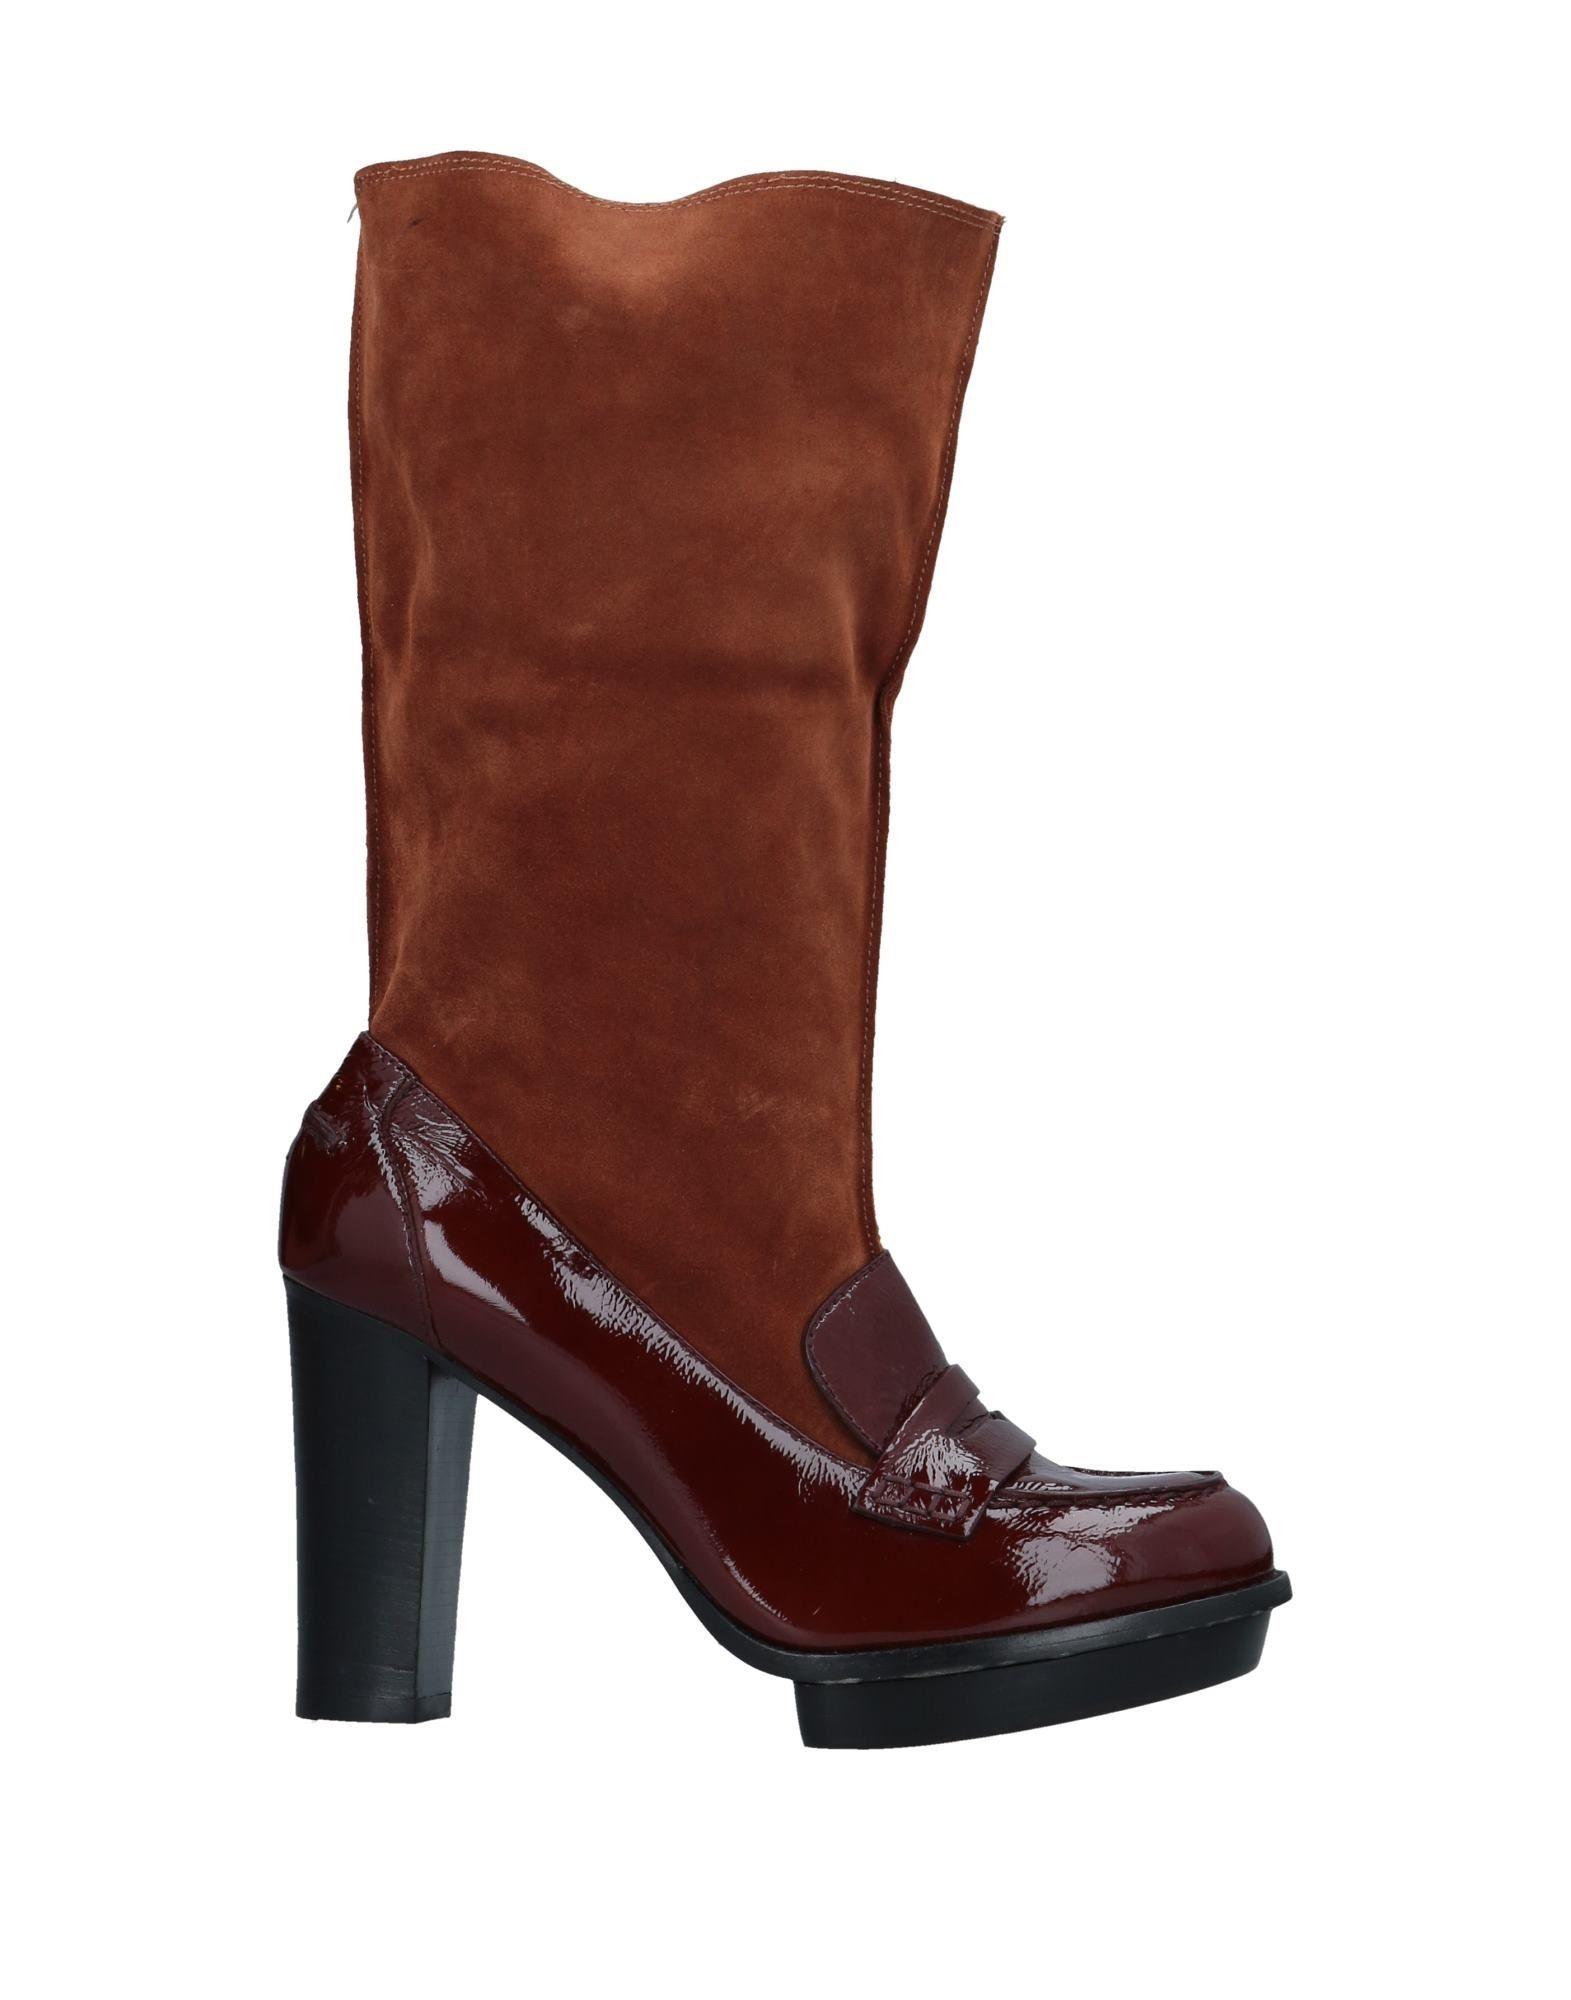 Rabatt Schuhe Marc By Marc Jacobs Stiefel Damen  11531001XN